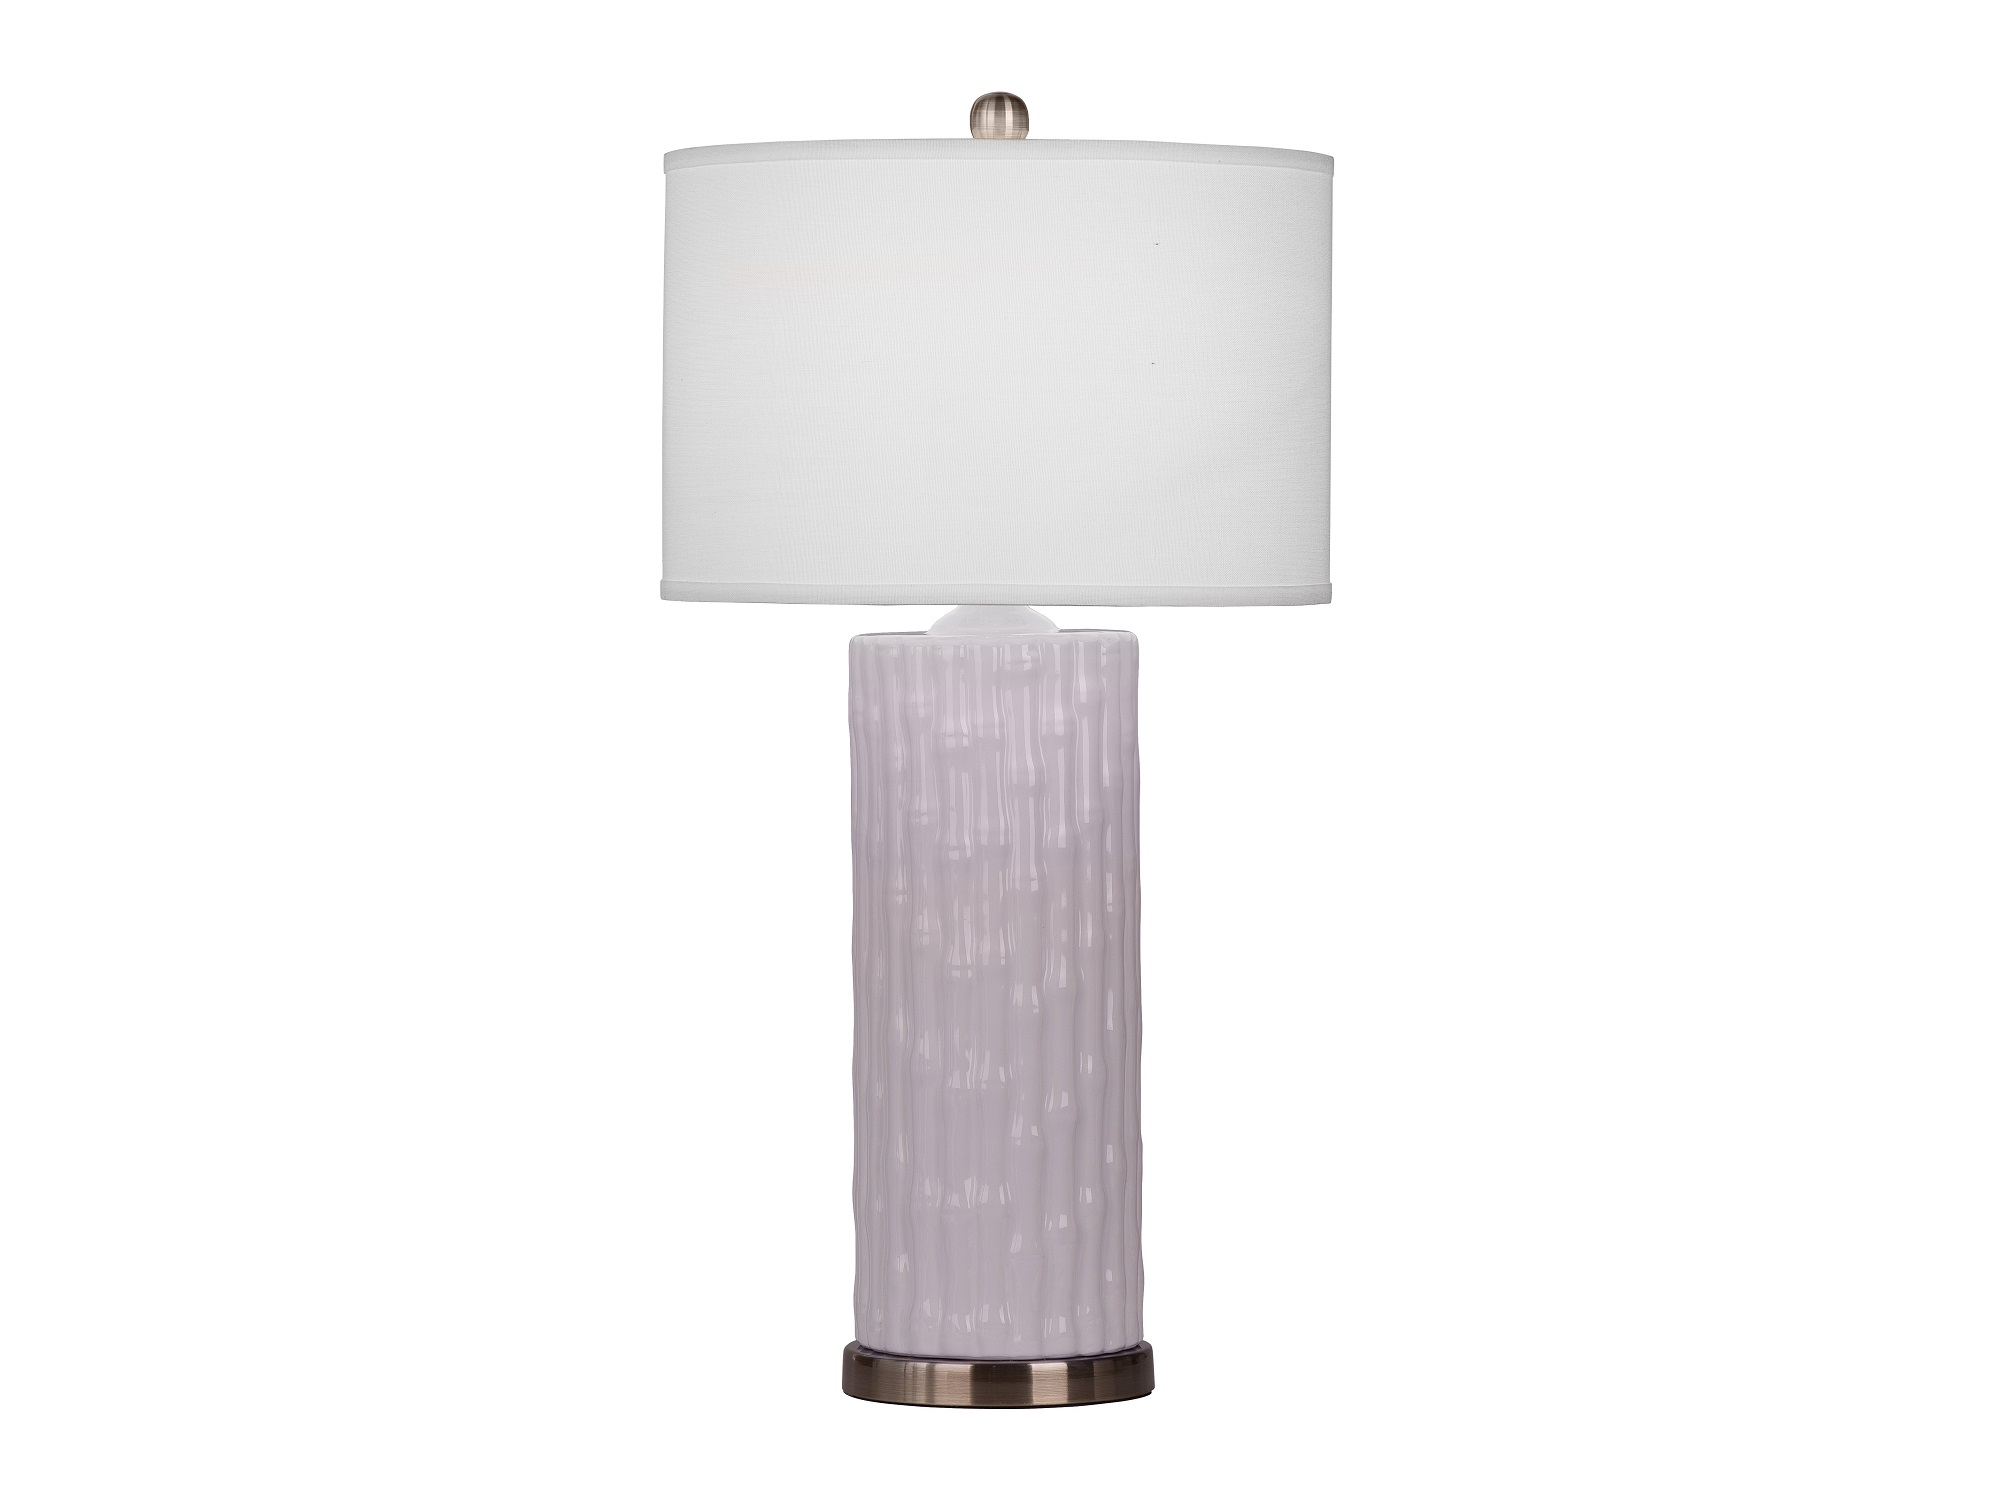 Настольная лампа БушеДекоративные лампы<br>Вид цоколя: E27Мощность:&amp;nbsp; 60WКоличество ламп: 1 (нет в комплекте)Материал: металл, керамика, текстиль<br><br>kit: None<br>gender: None